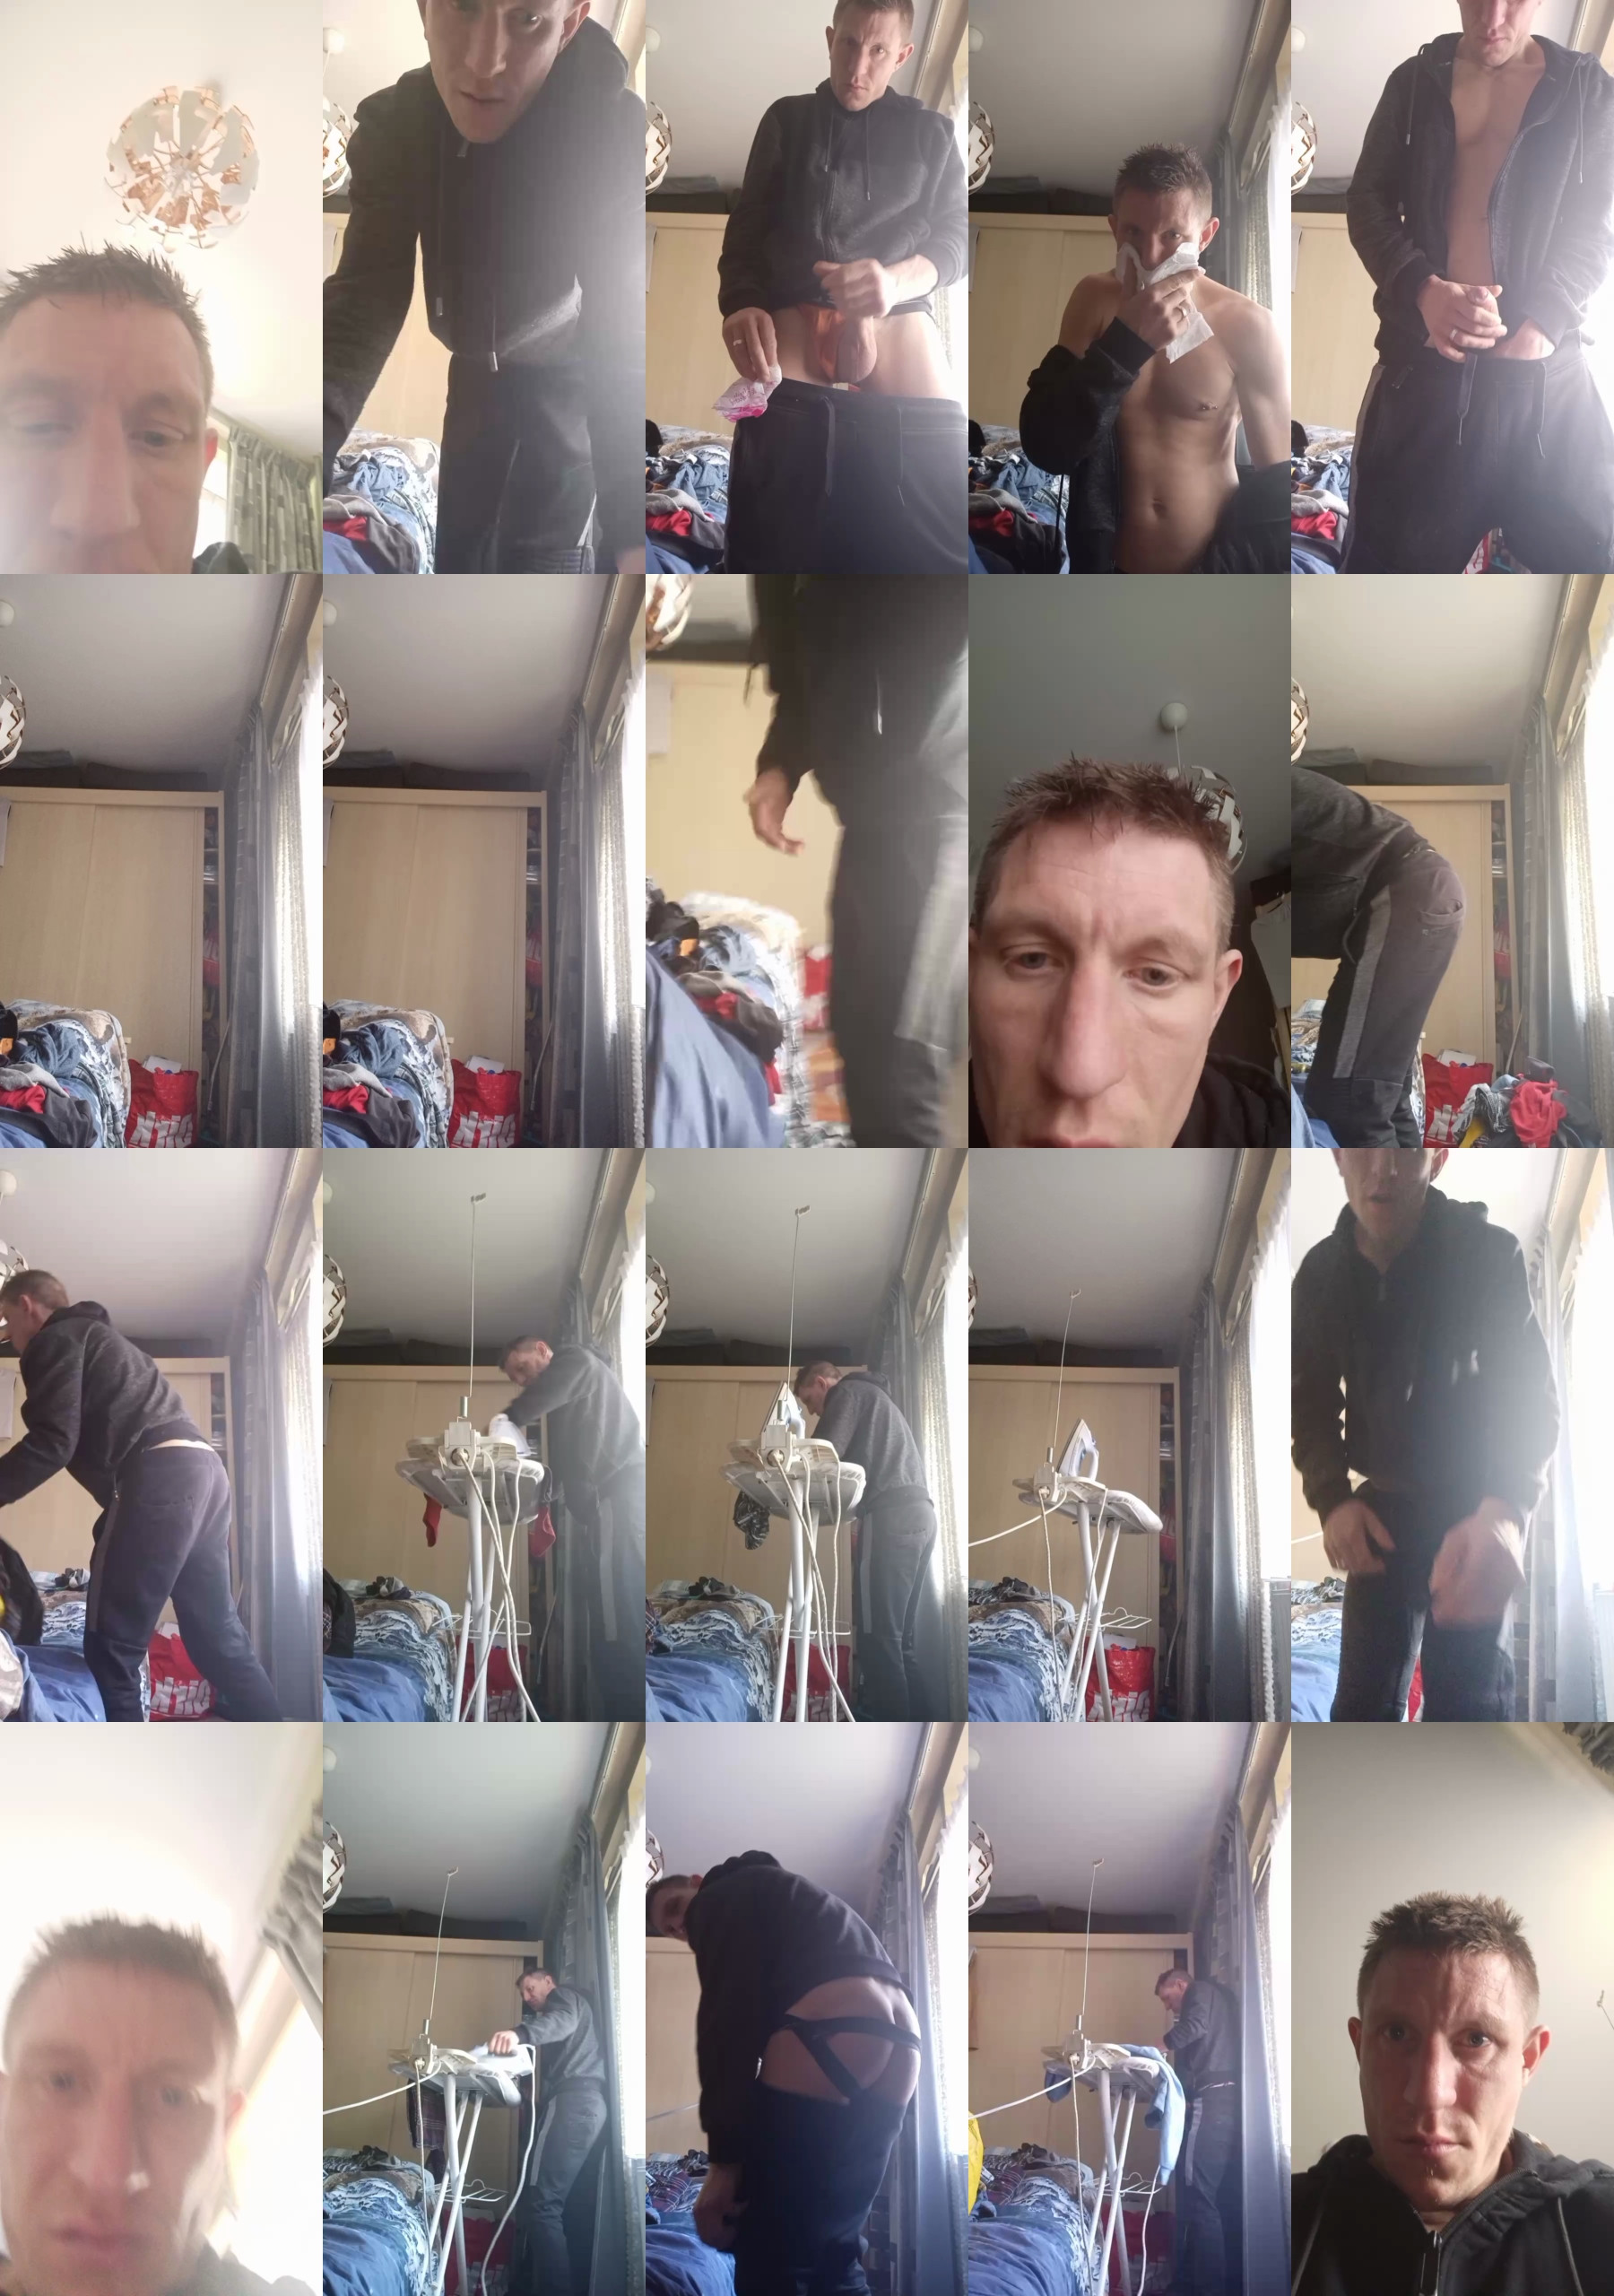 Slavefortatoo Cam4 14-04-2021 Recorded Video Webcam